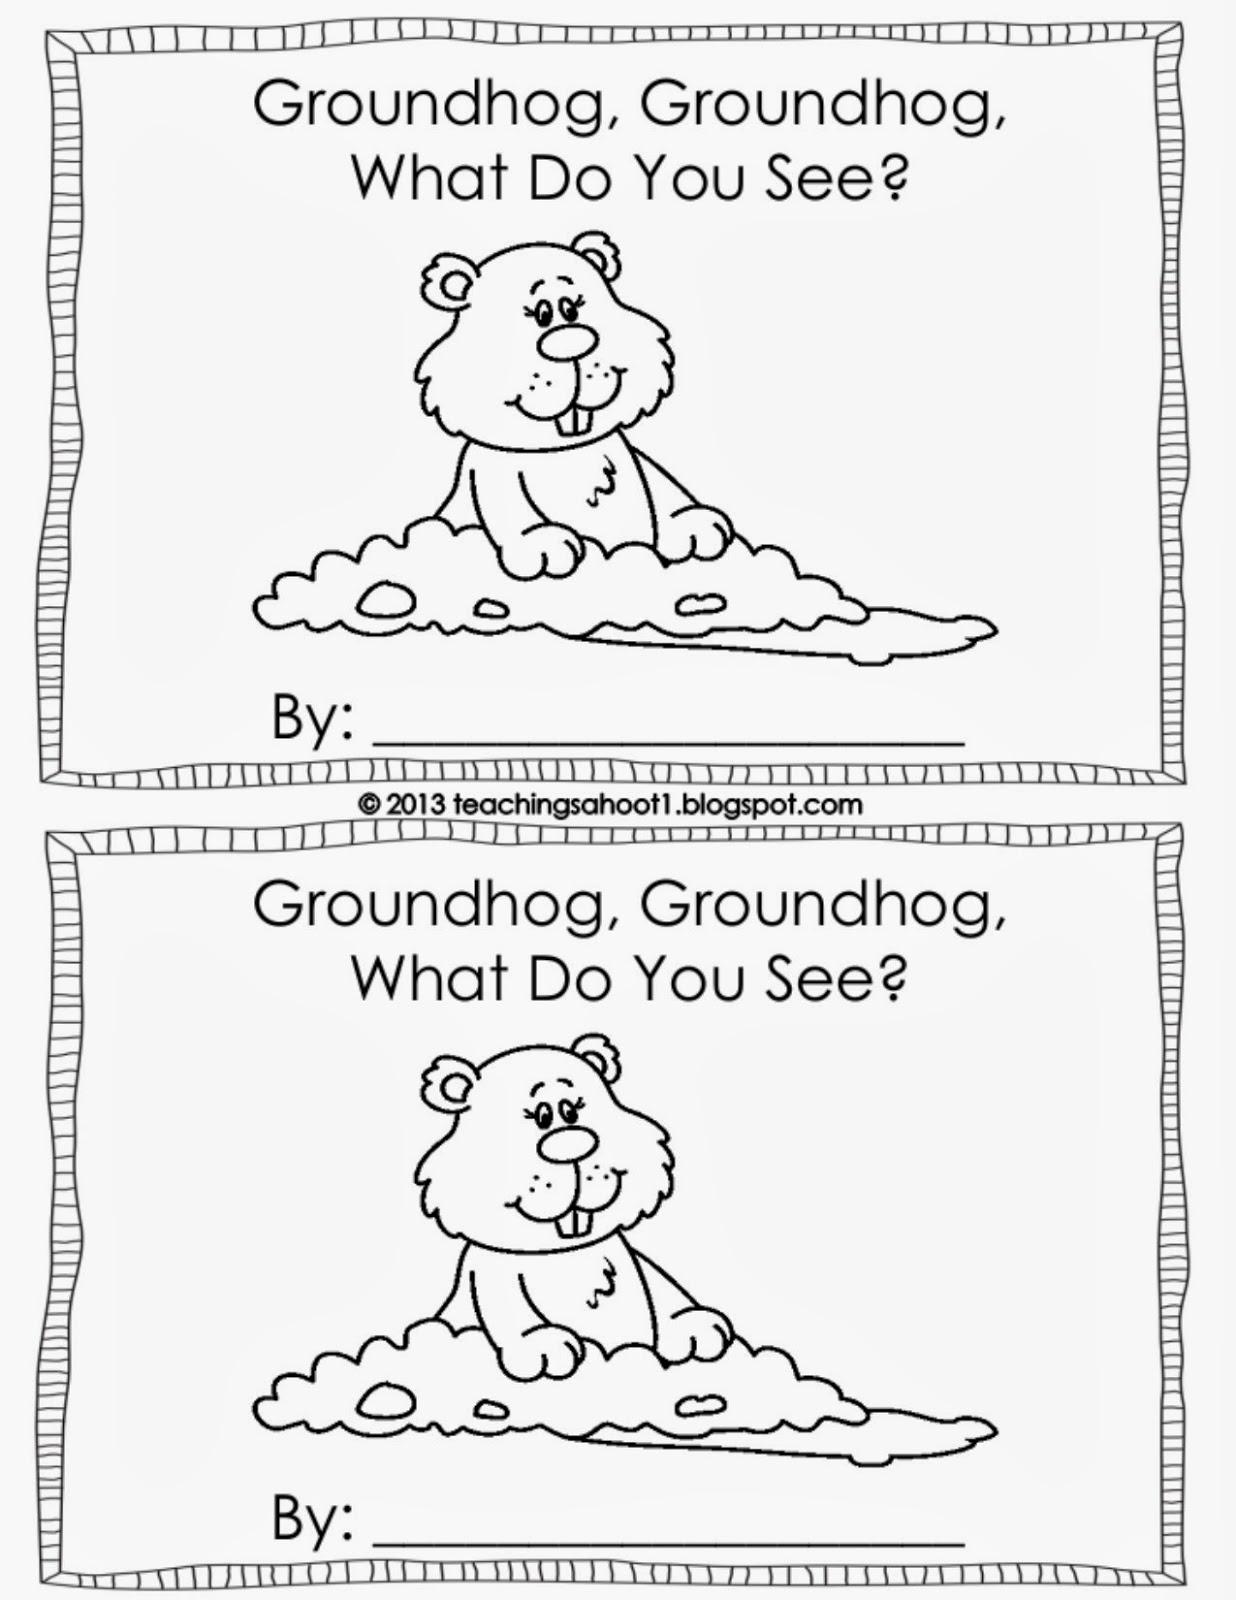 Uncategorized Groundhog Day Math Worksheets hd wallpapers groundhog day worksheets first grade wallpaper get free high quality grade